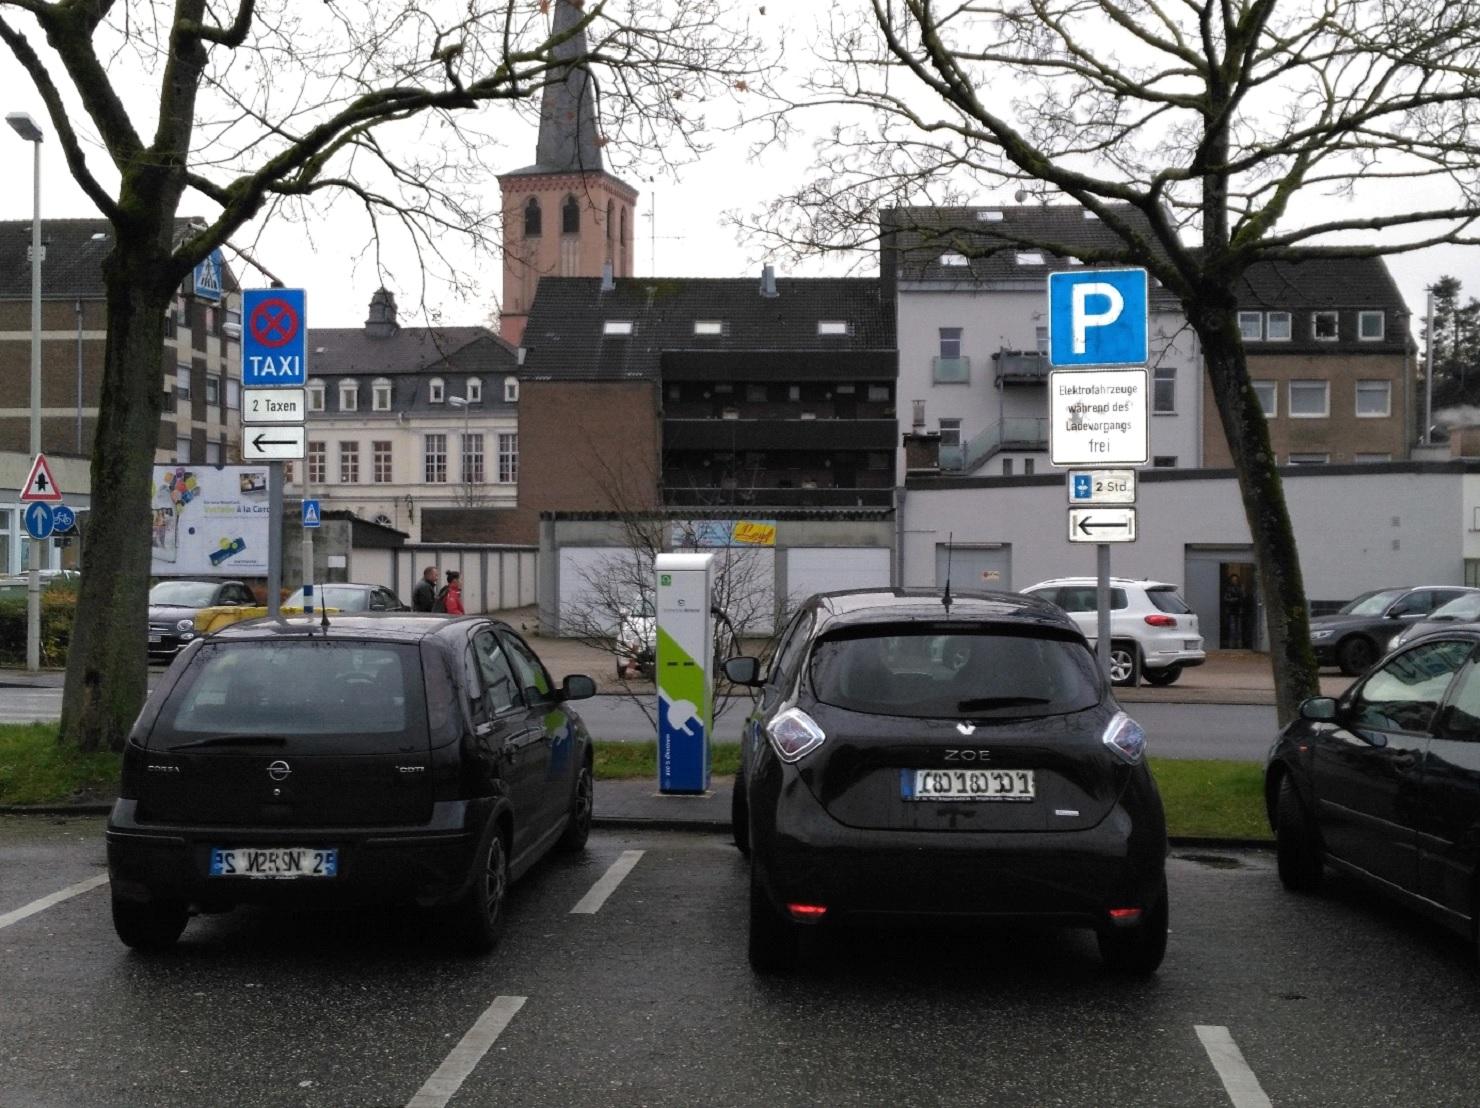 Strom tanken am Doerkesplatz – Beschilderung wird auf Wunsch der Grünen geändert